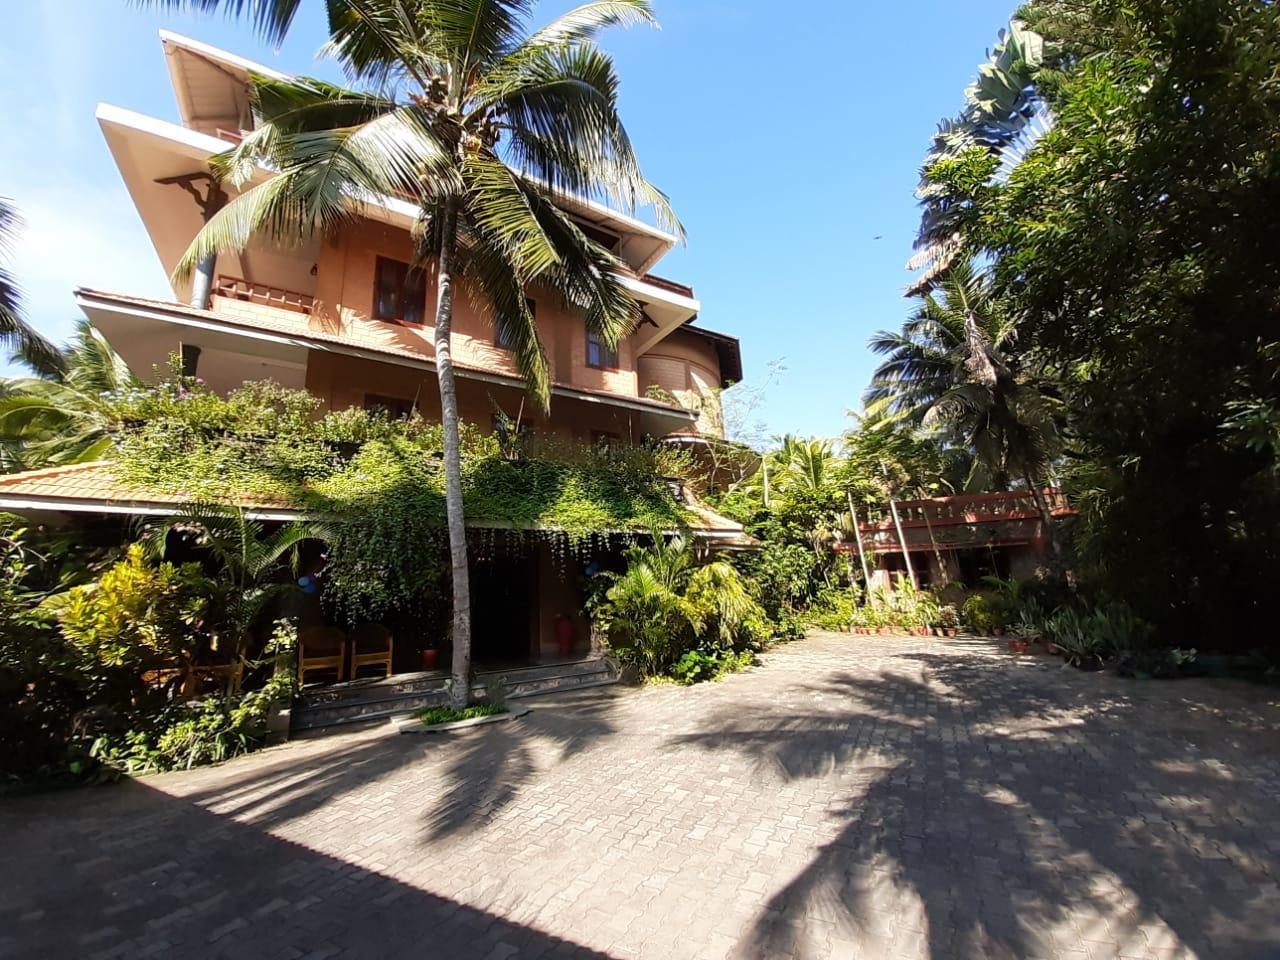 Wild Palms On Sea Hotel